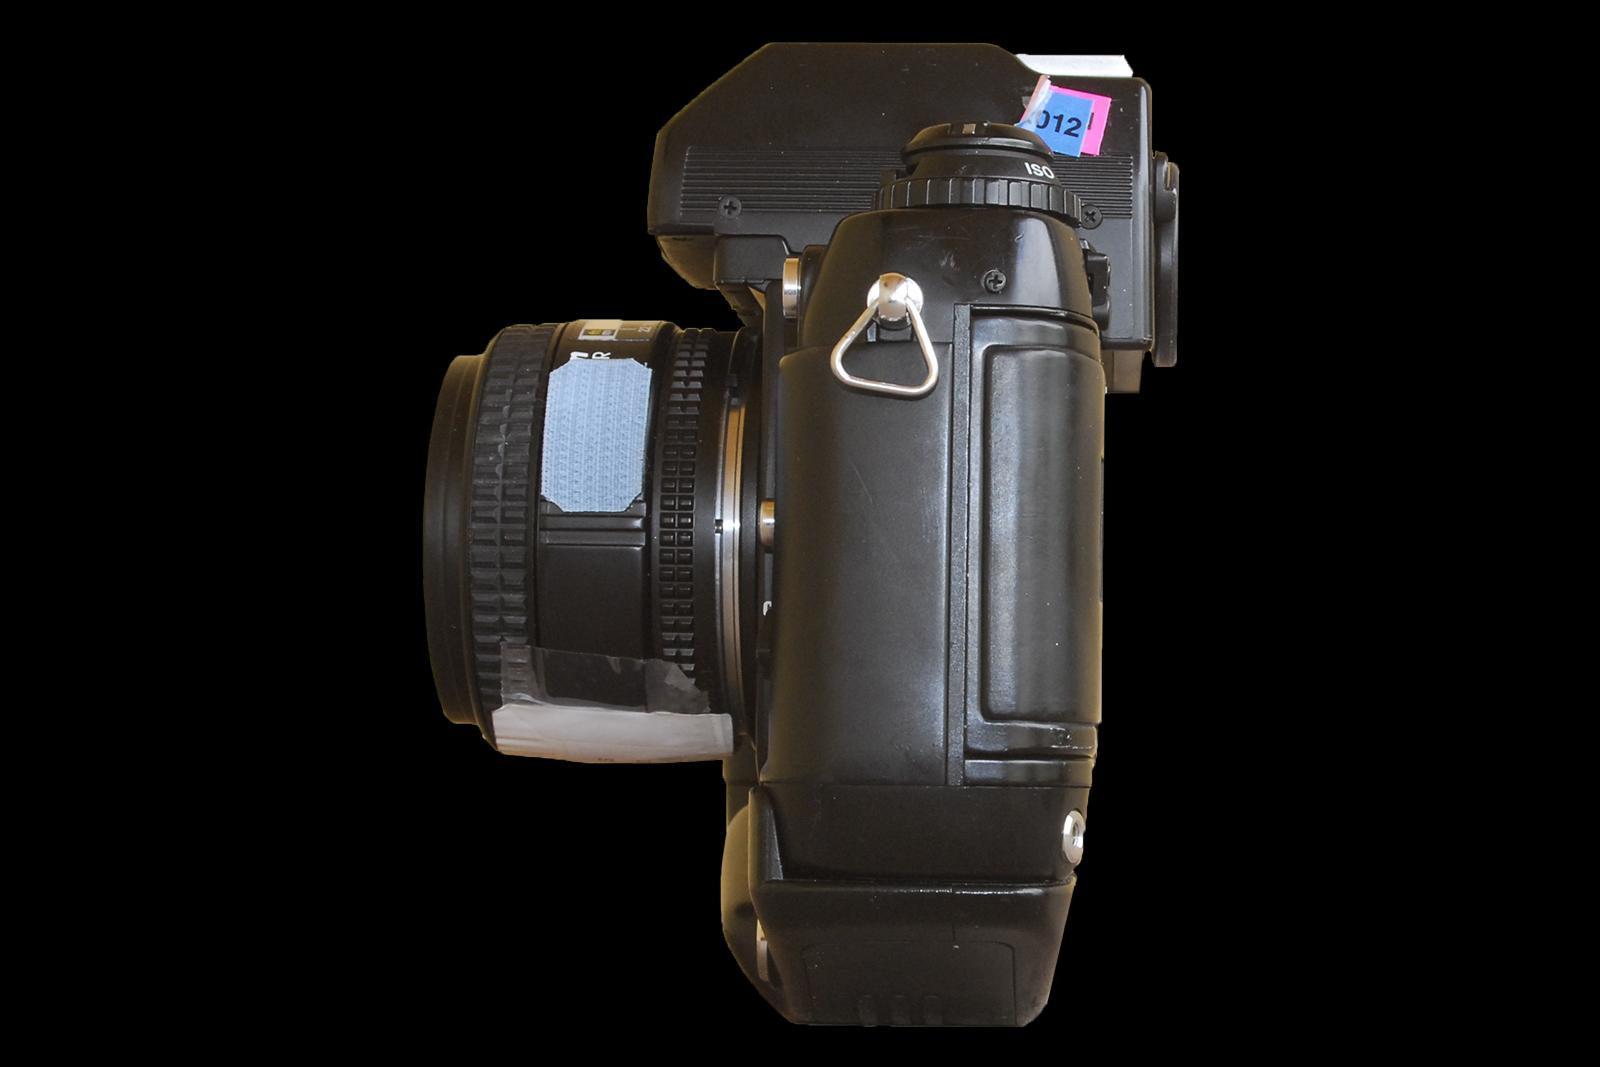 nasa nikon, nasa camera, space camera, nikon f4, Nikon F4S, photo